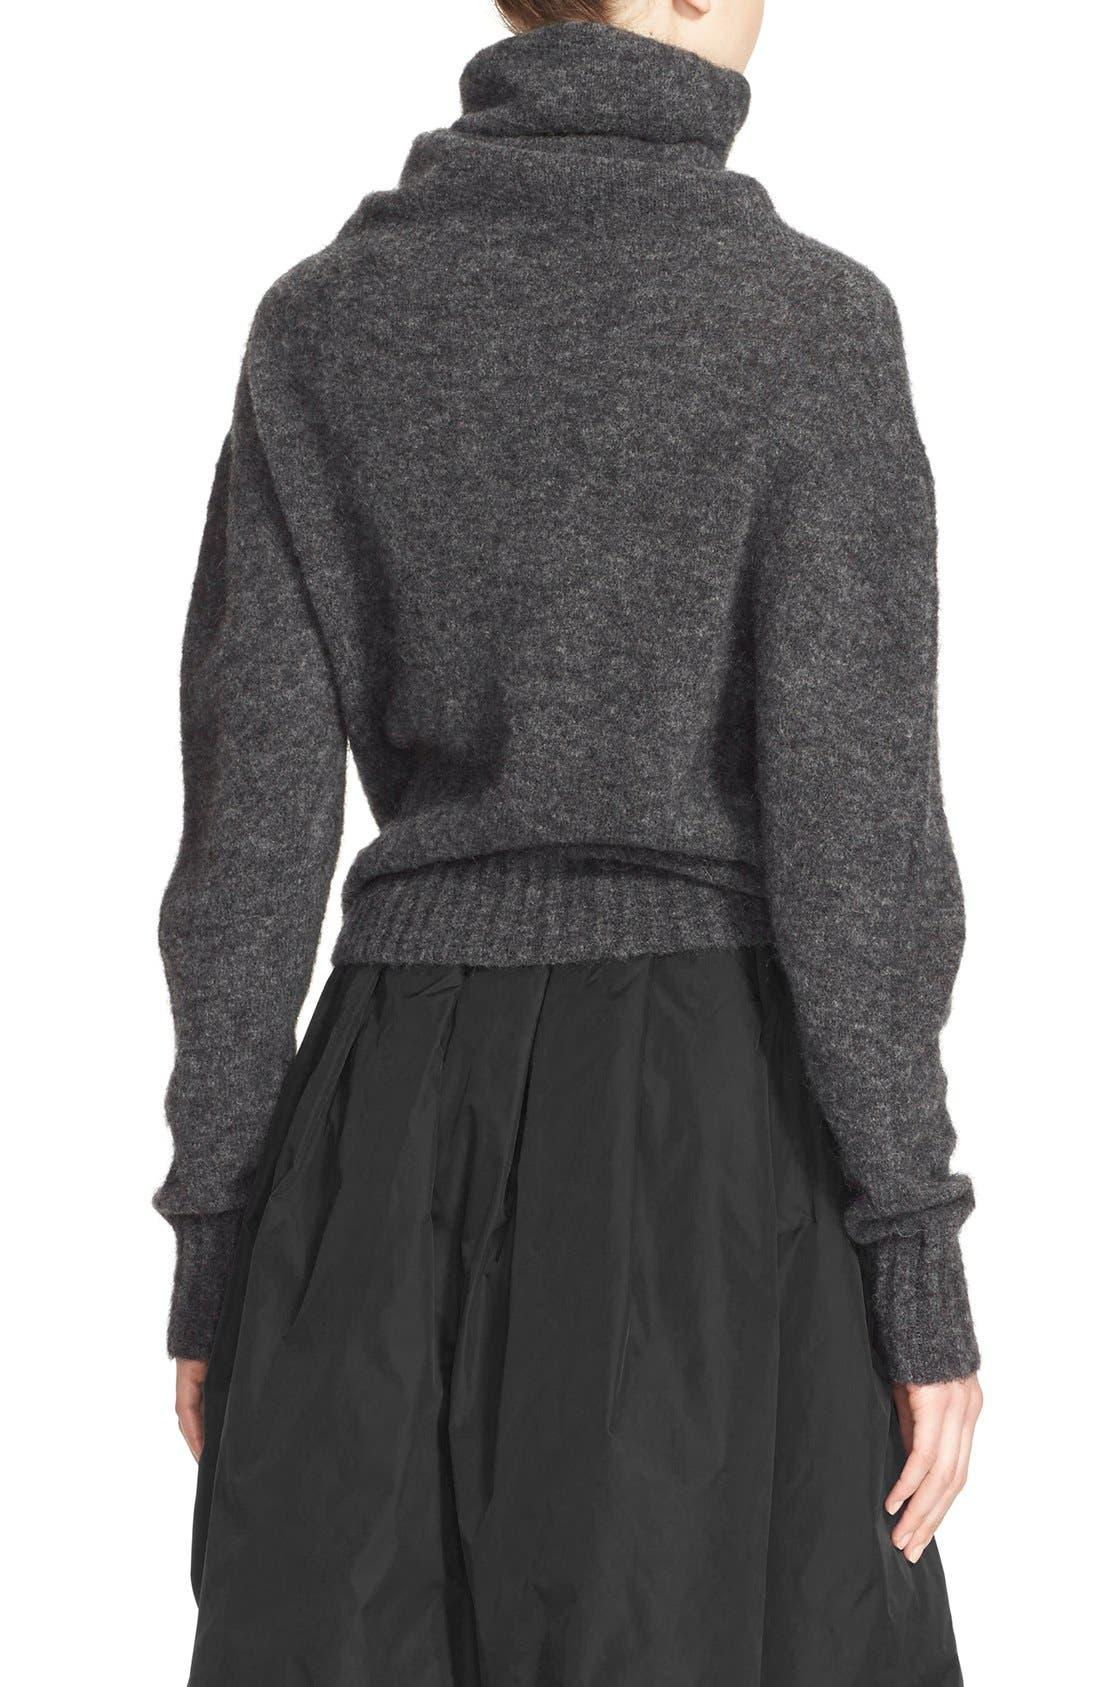 'Voletta Mohair' Turtleneck Sweater,                             Alternate thumbnail 3, color,                             021